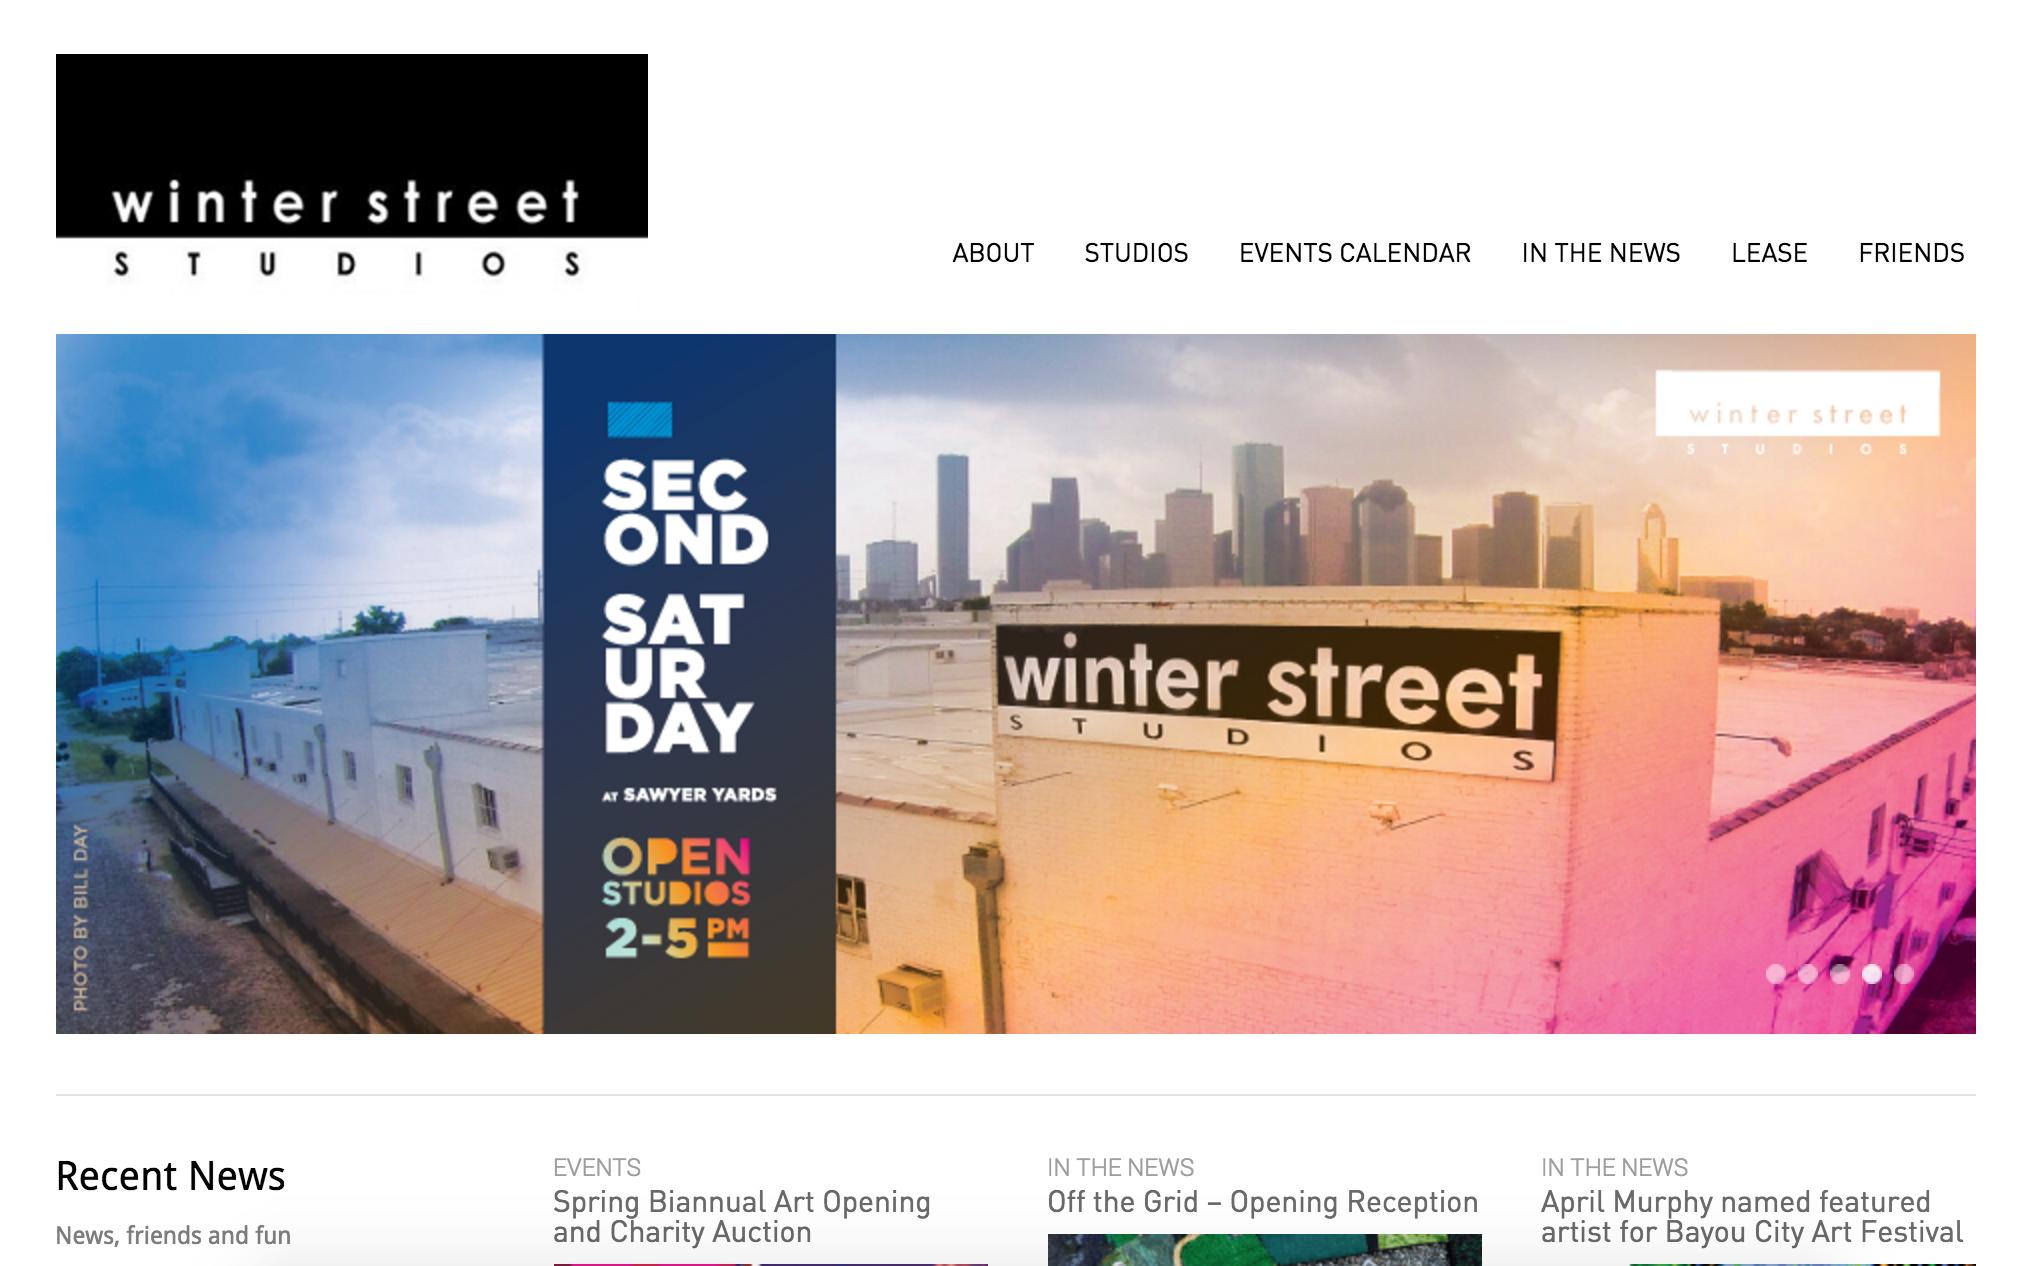 Winter Street Studios